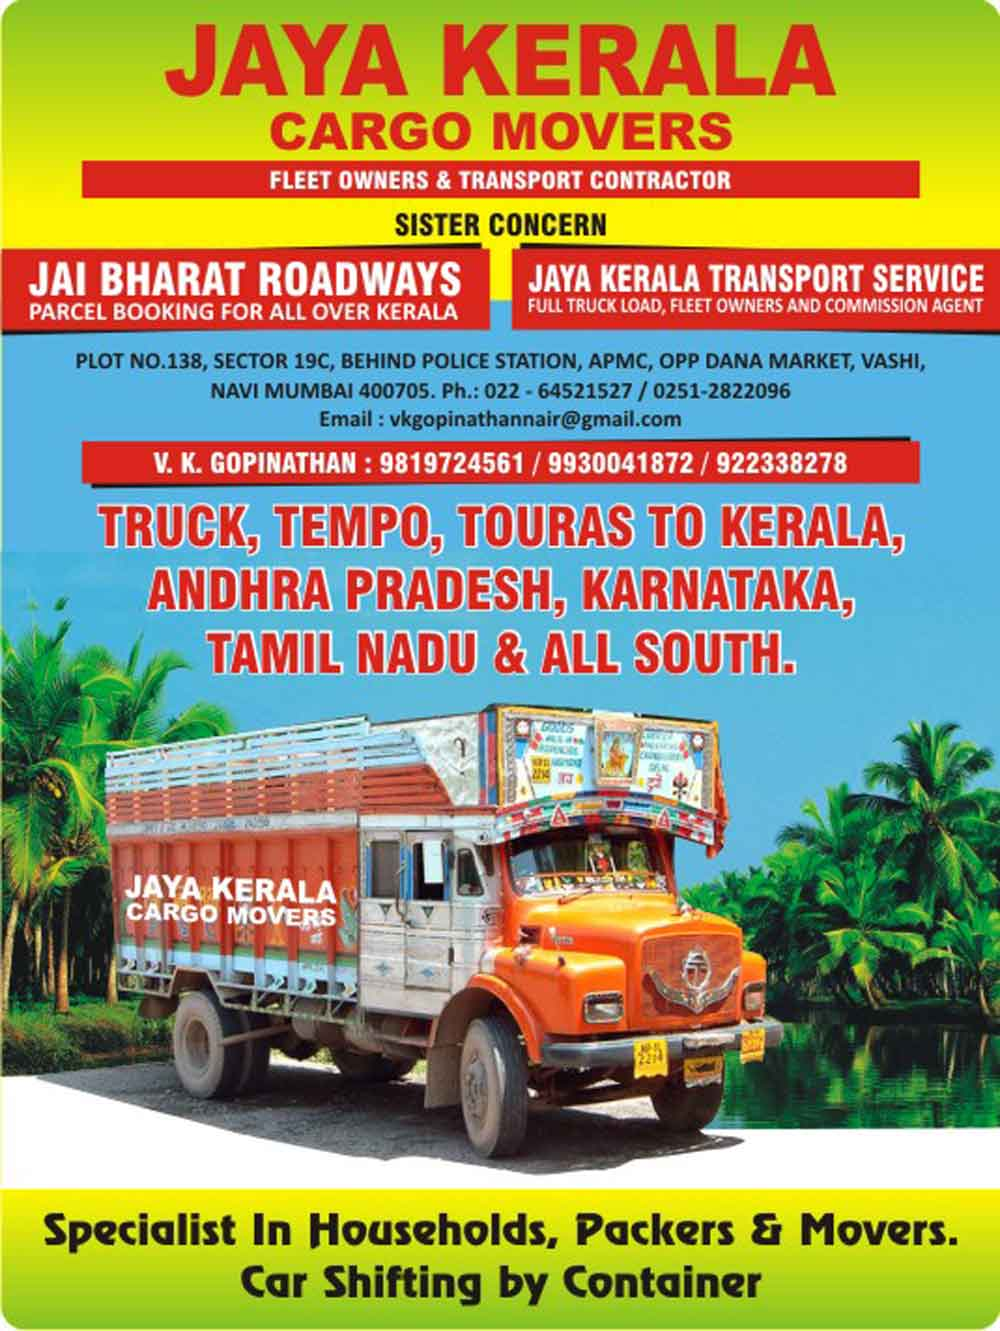 Jaya Kerala Cargo Movers